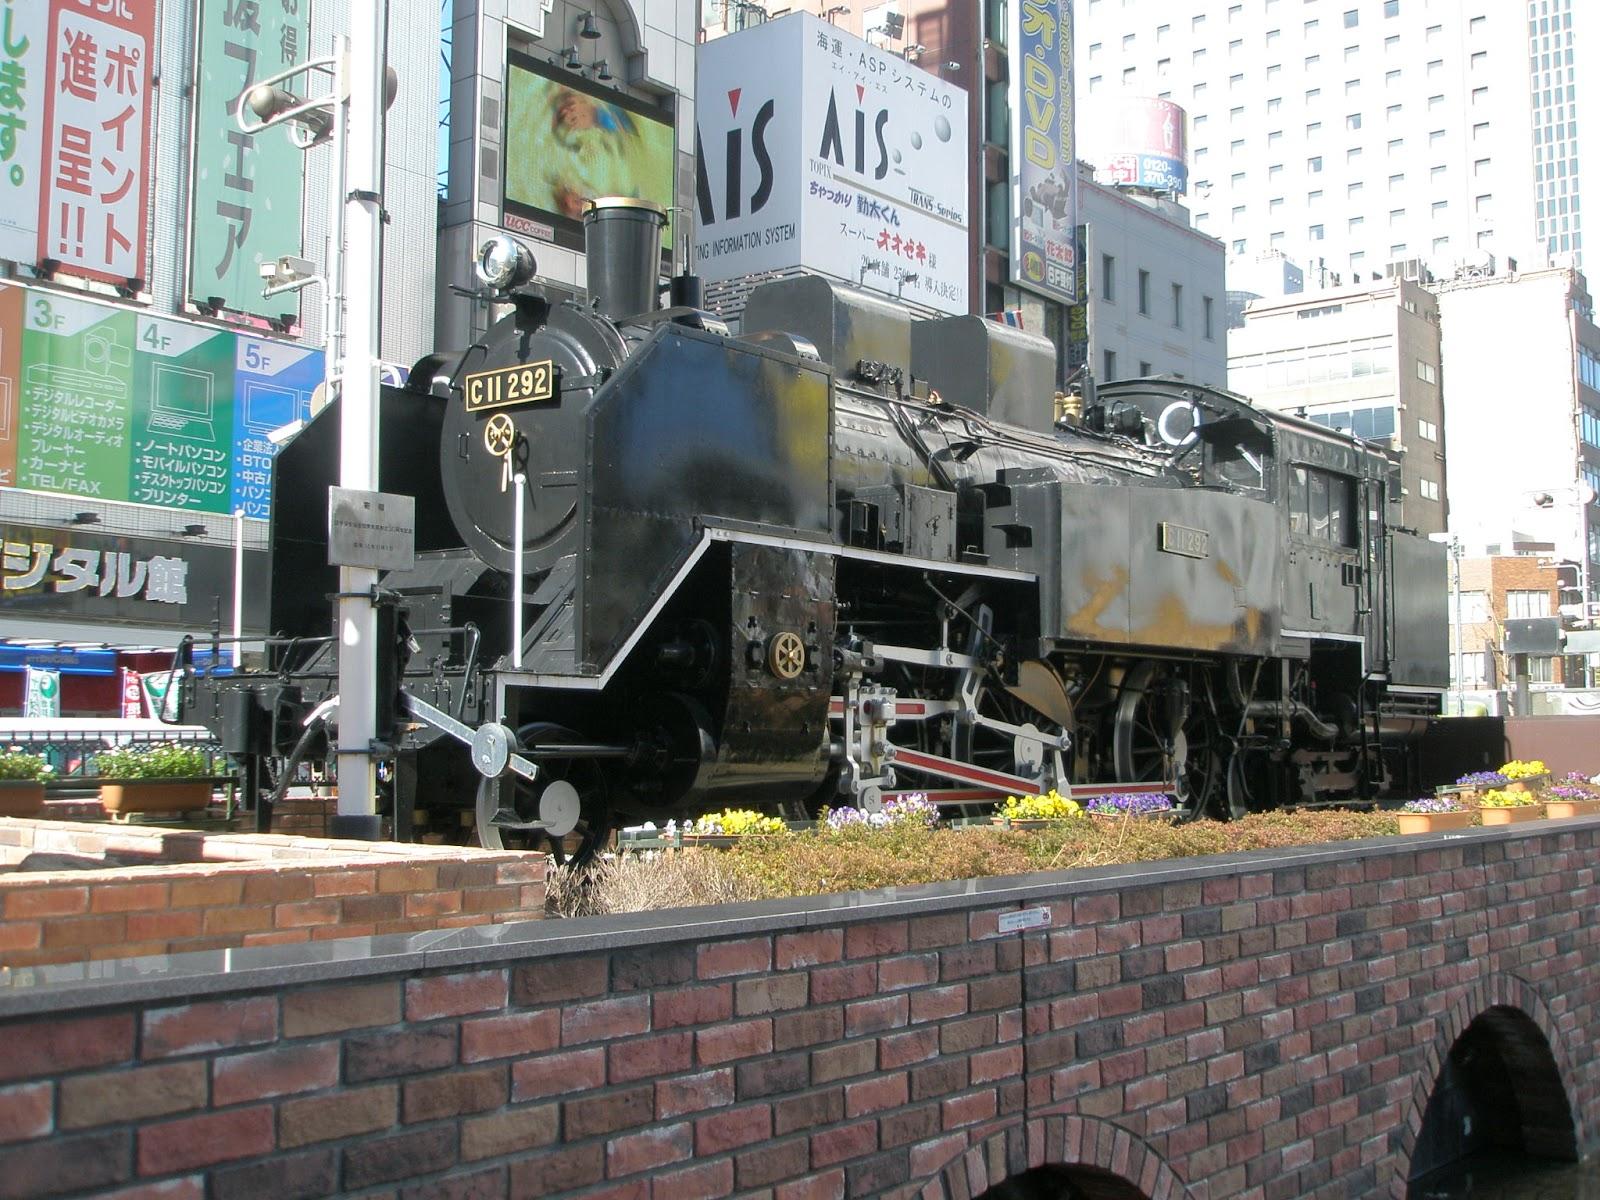 JNR_C11_292_Shinbashi_Sta_20080213.jpg